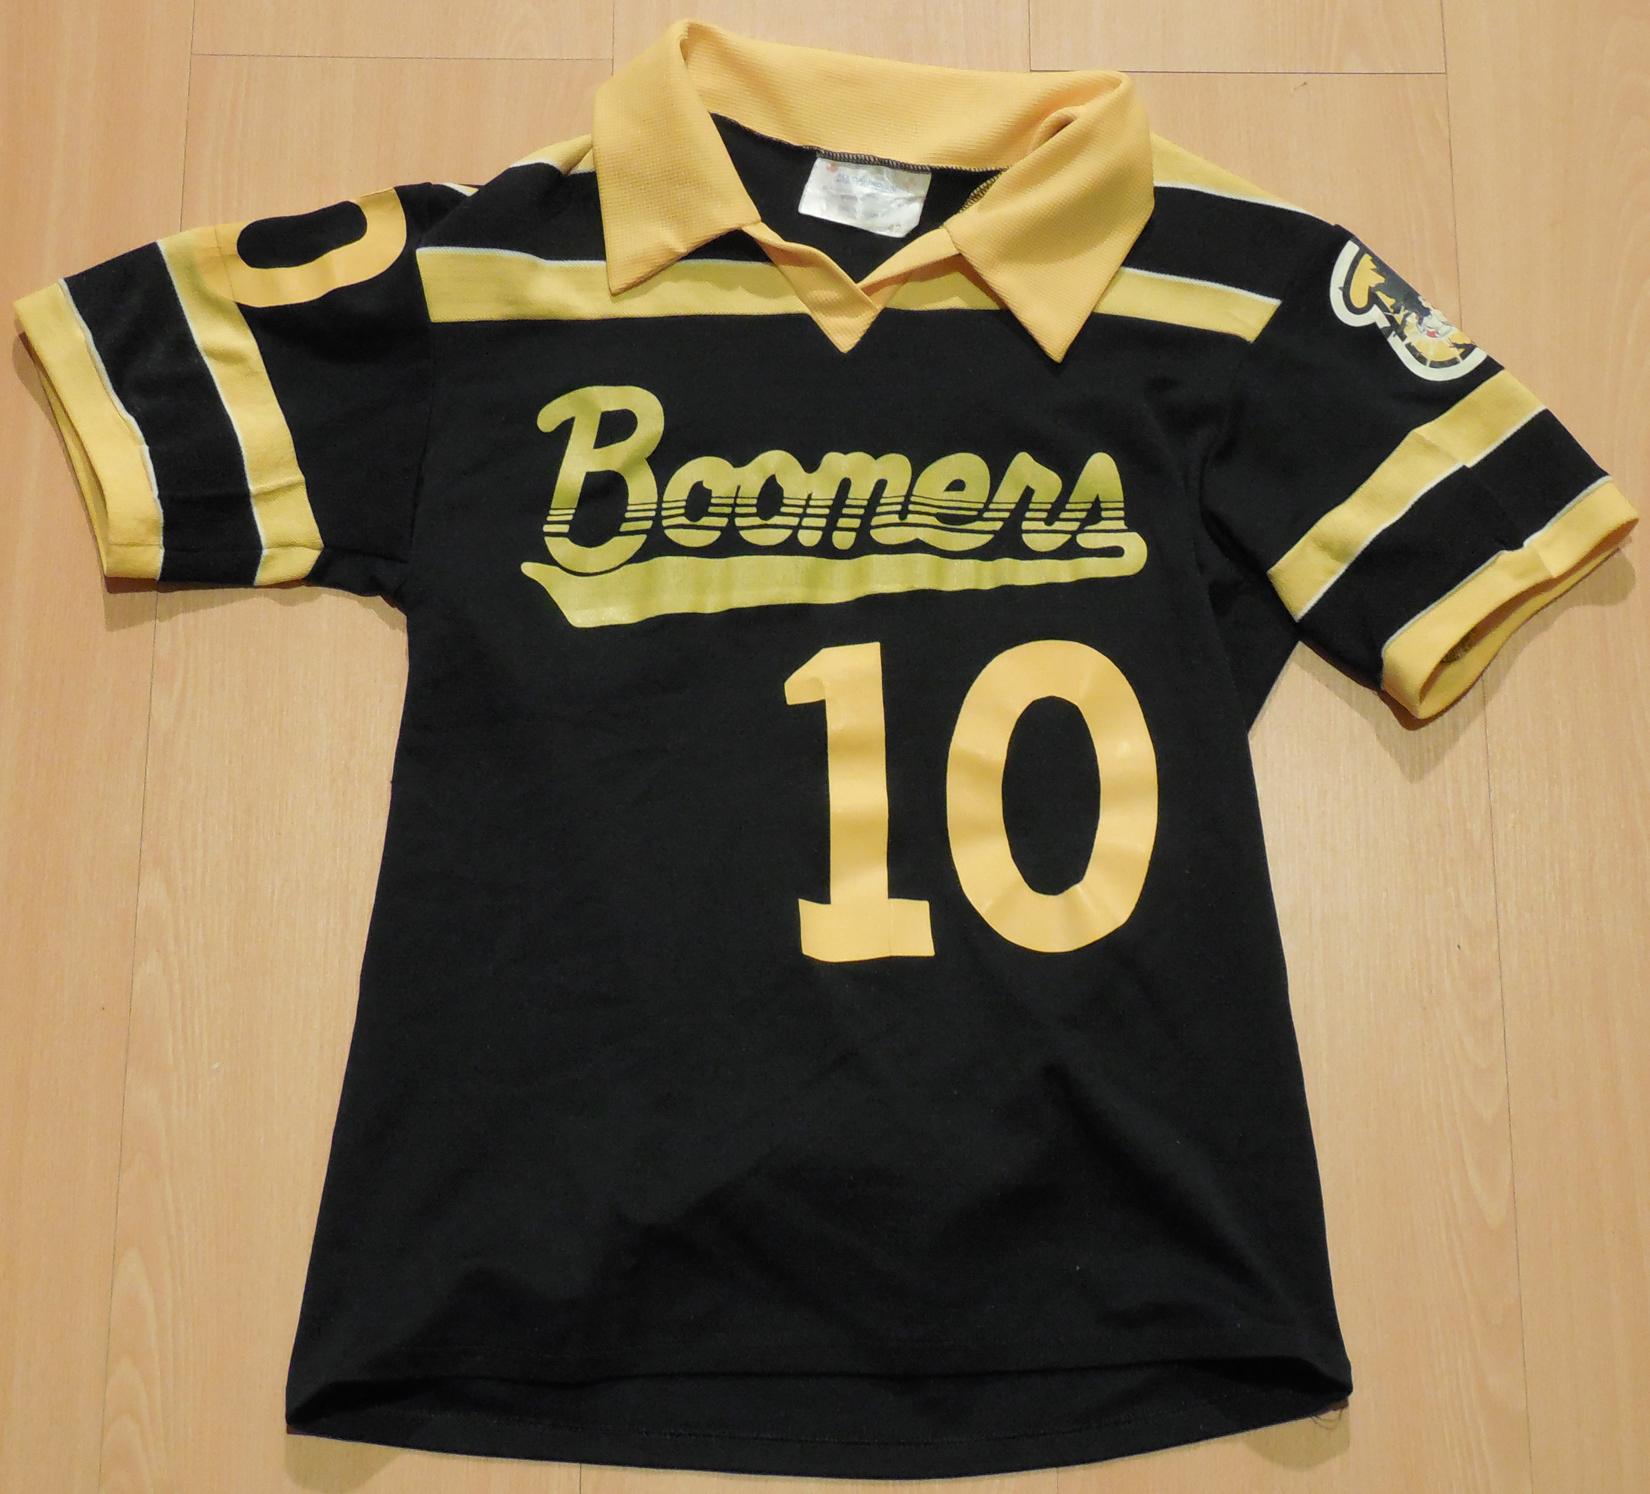 Boomers 81 Road Jersey Juan Molina (1).JPG